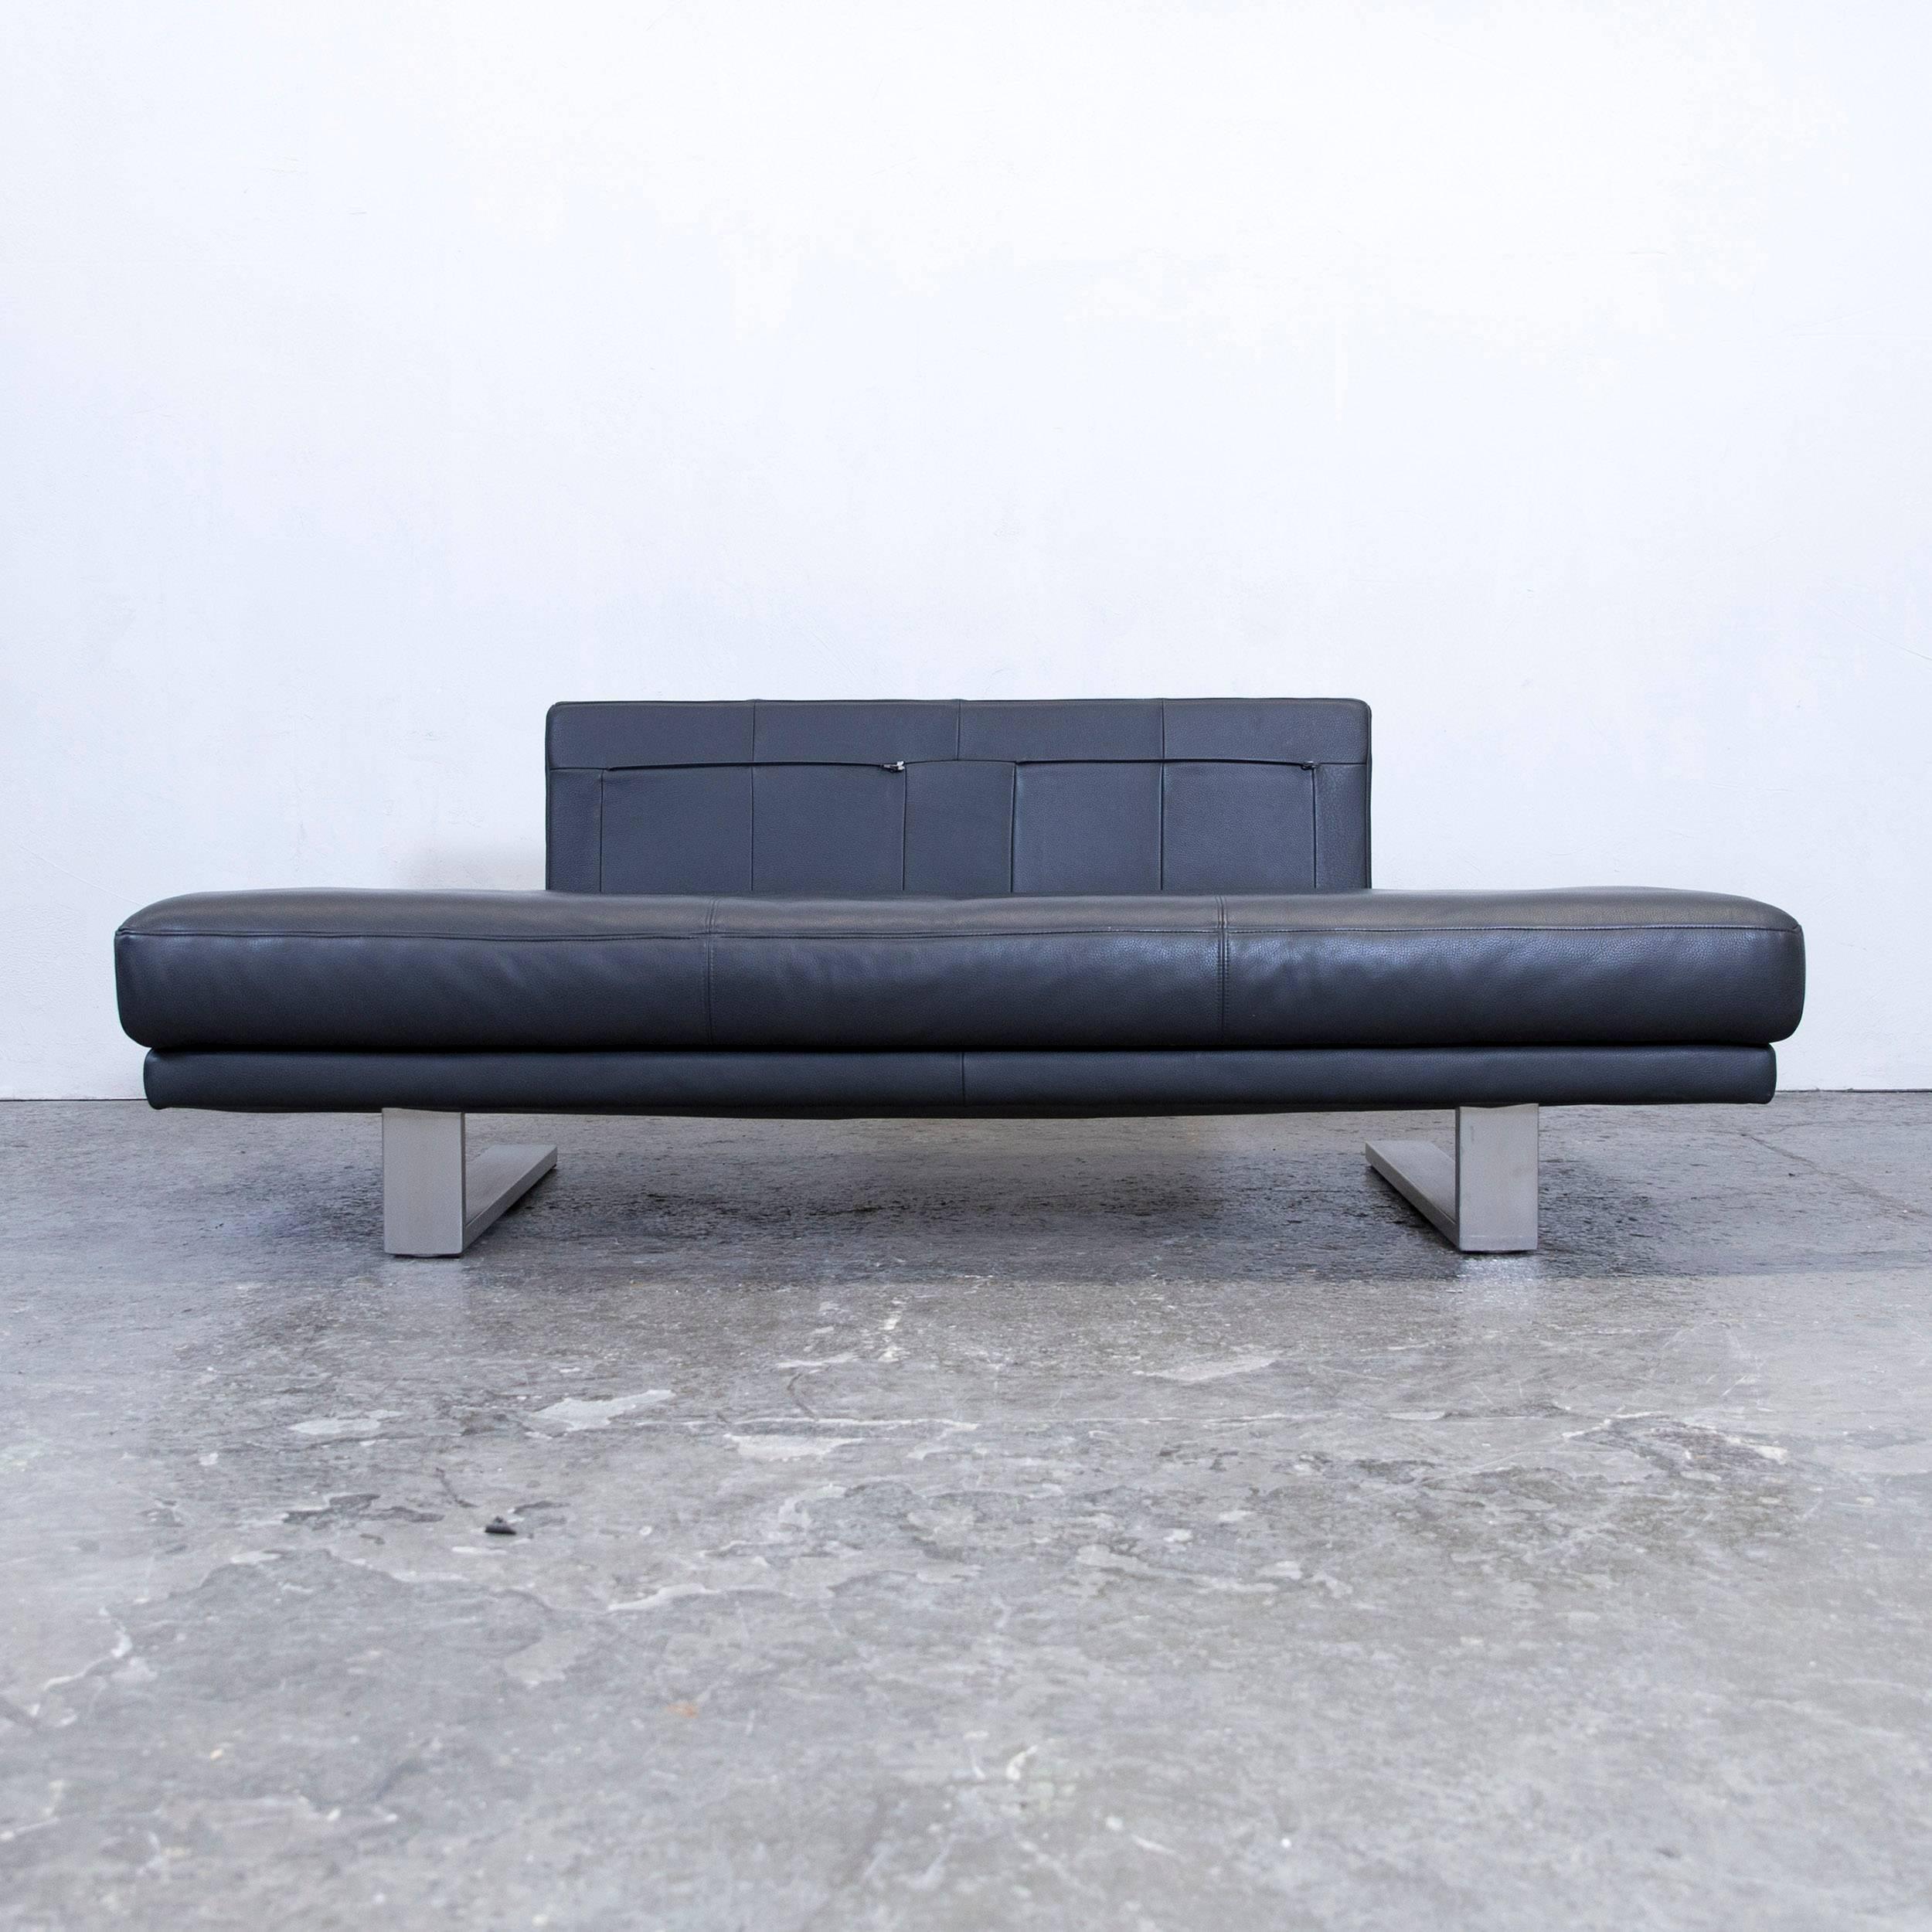 rolf benz plura sofa fabulous rolf benz agio sofa was. Black Bedroom Furniture Sets. Home Design Ideas